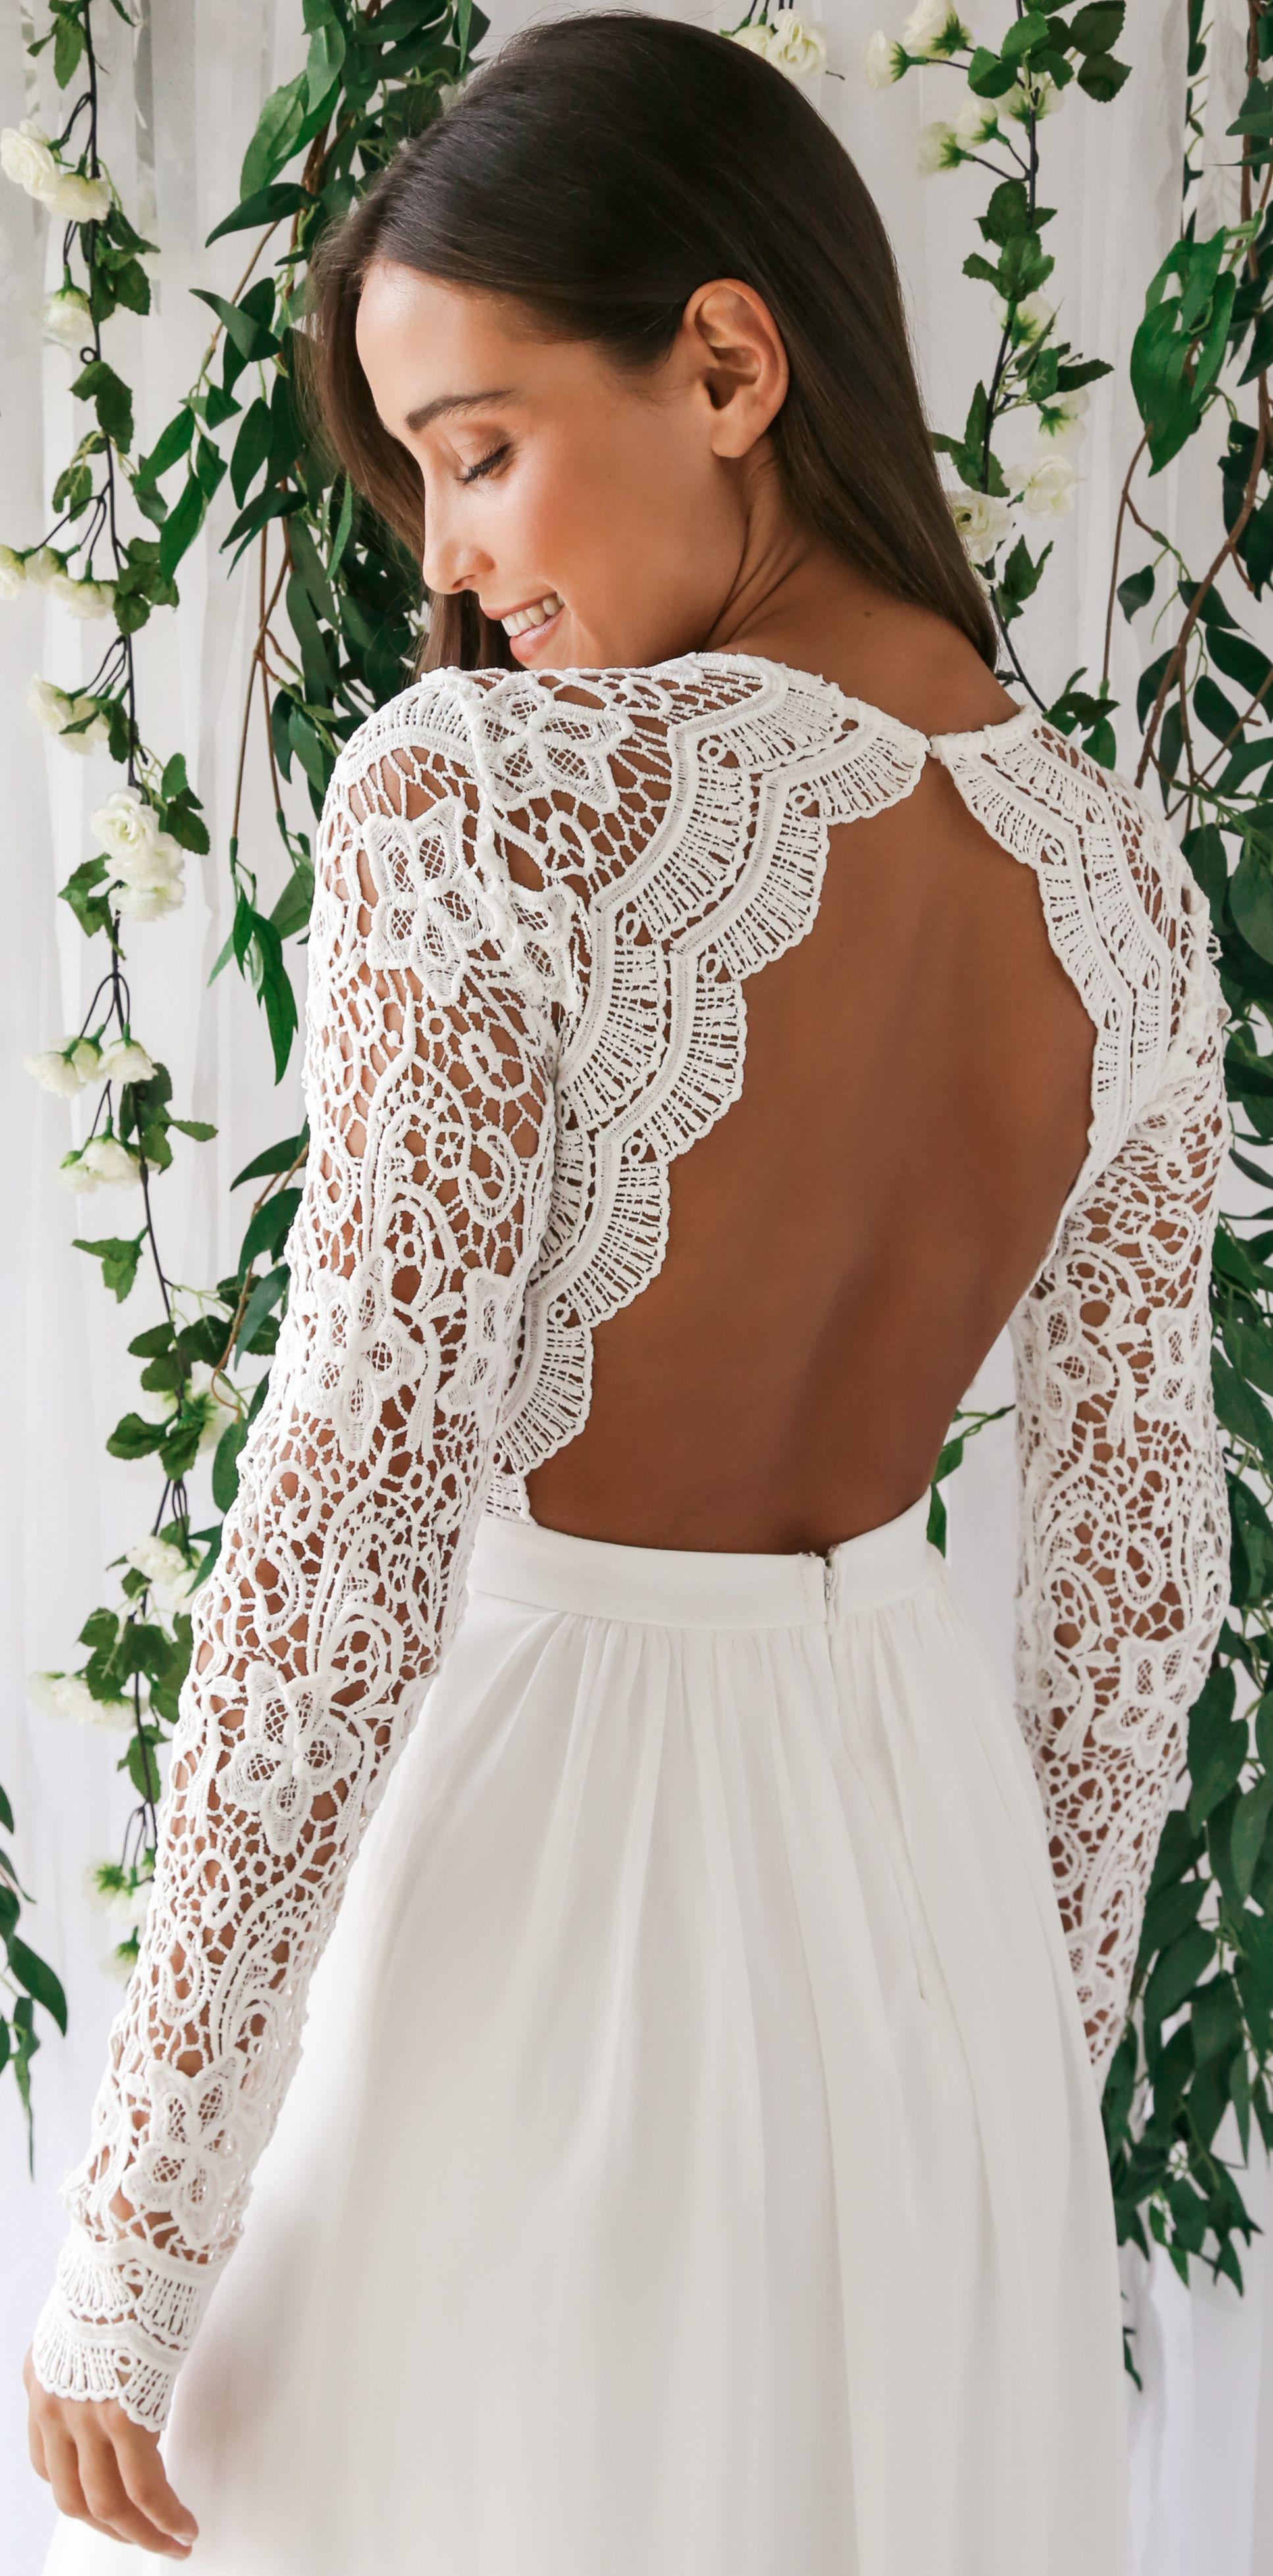 Awaken My Love White Long Sleeve Lace Maxi Dress Long Sleeve Lace Maxi Dress Wedding Dress Outfit Wedding Dresses [ 3915 x 1934 Pixel ]